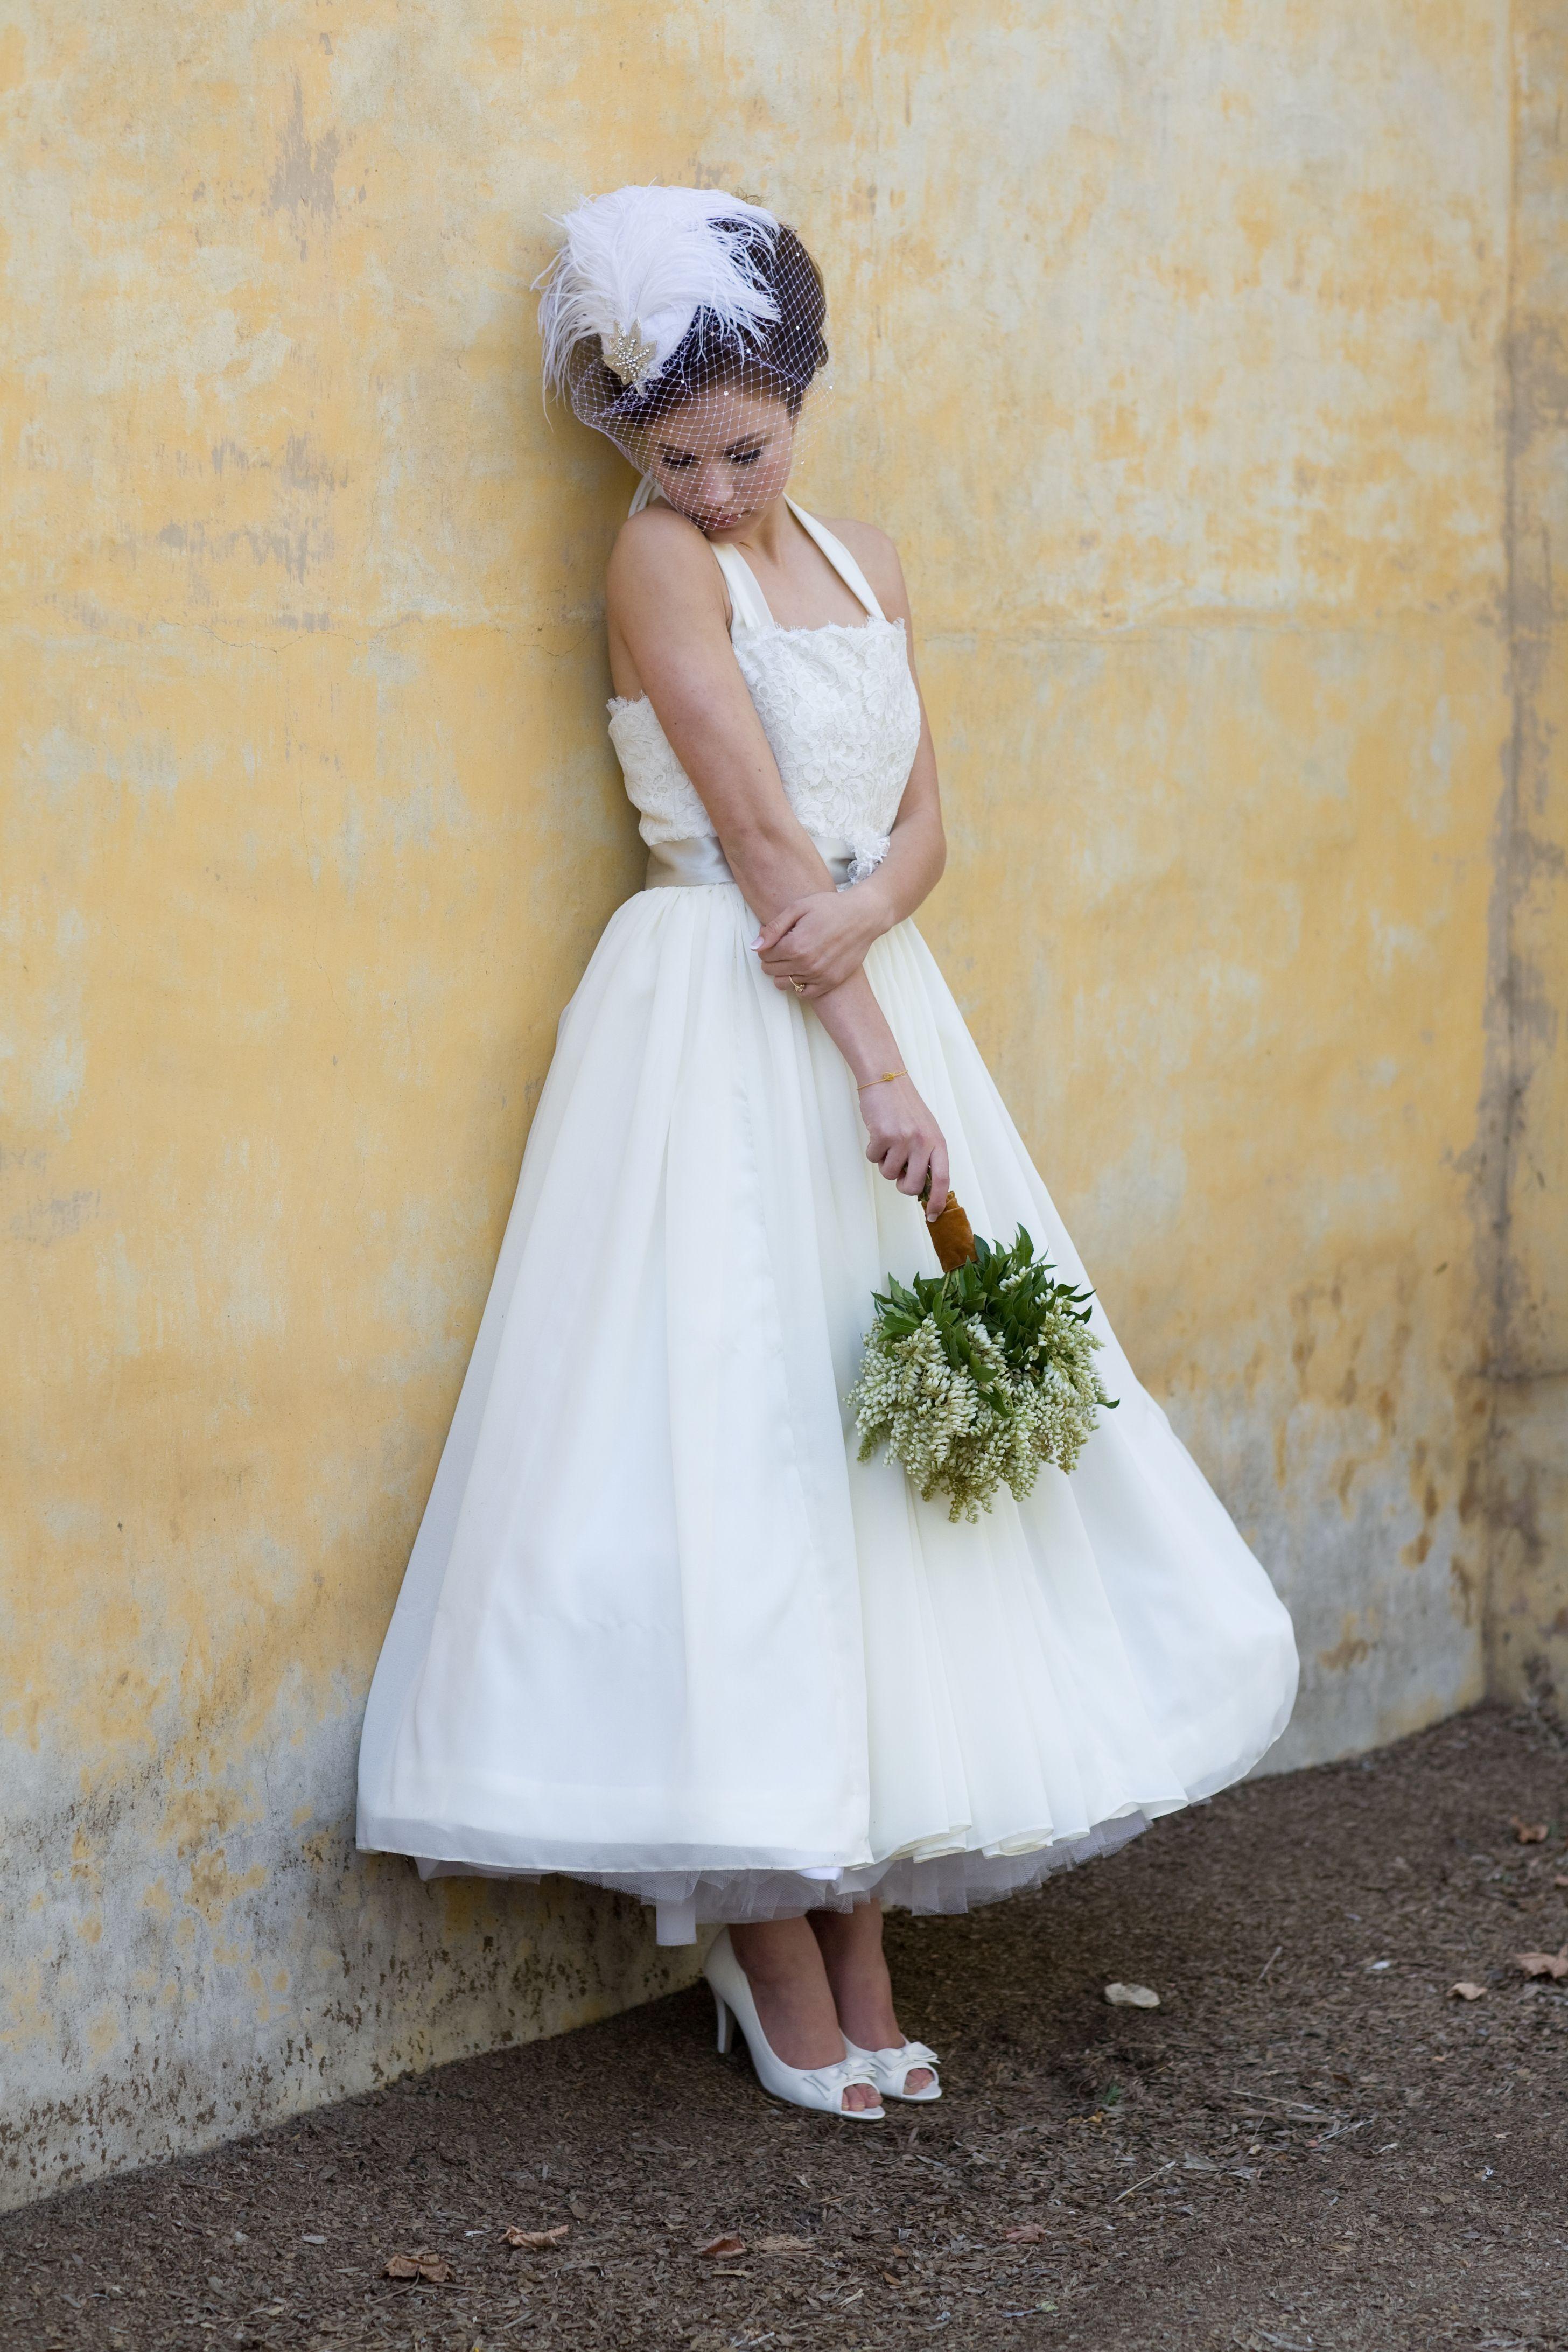 S wedding dress umirau vintage gowns rustic and vintage